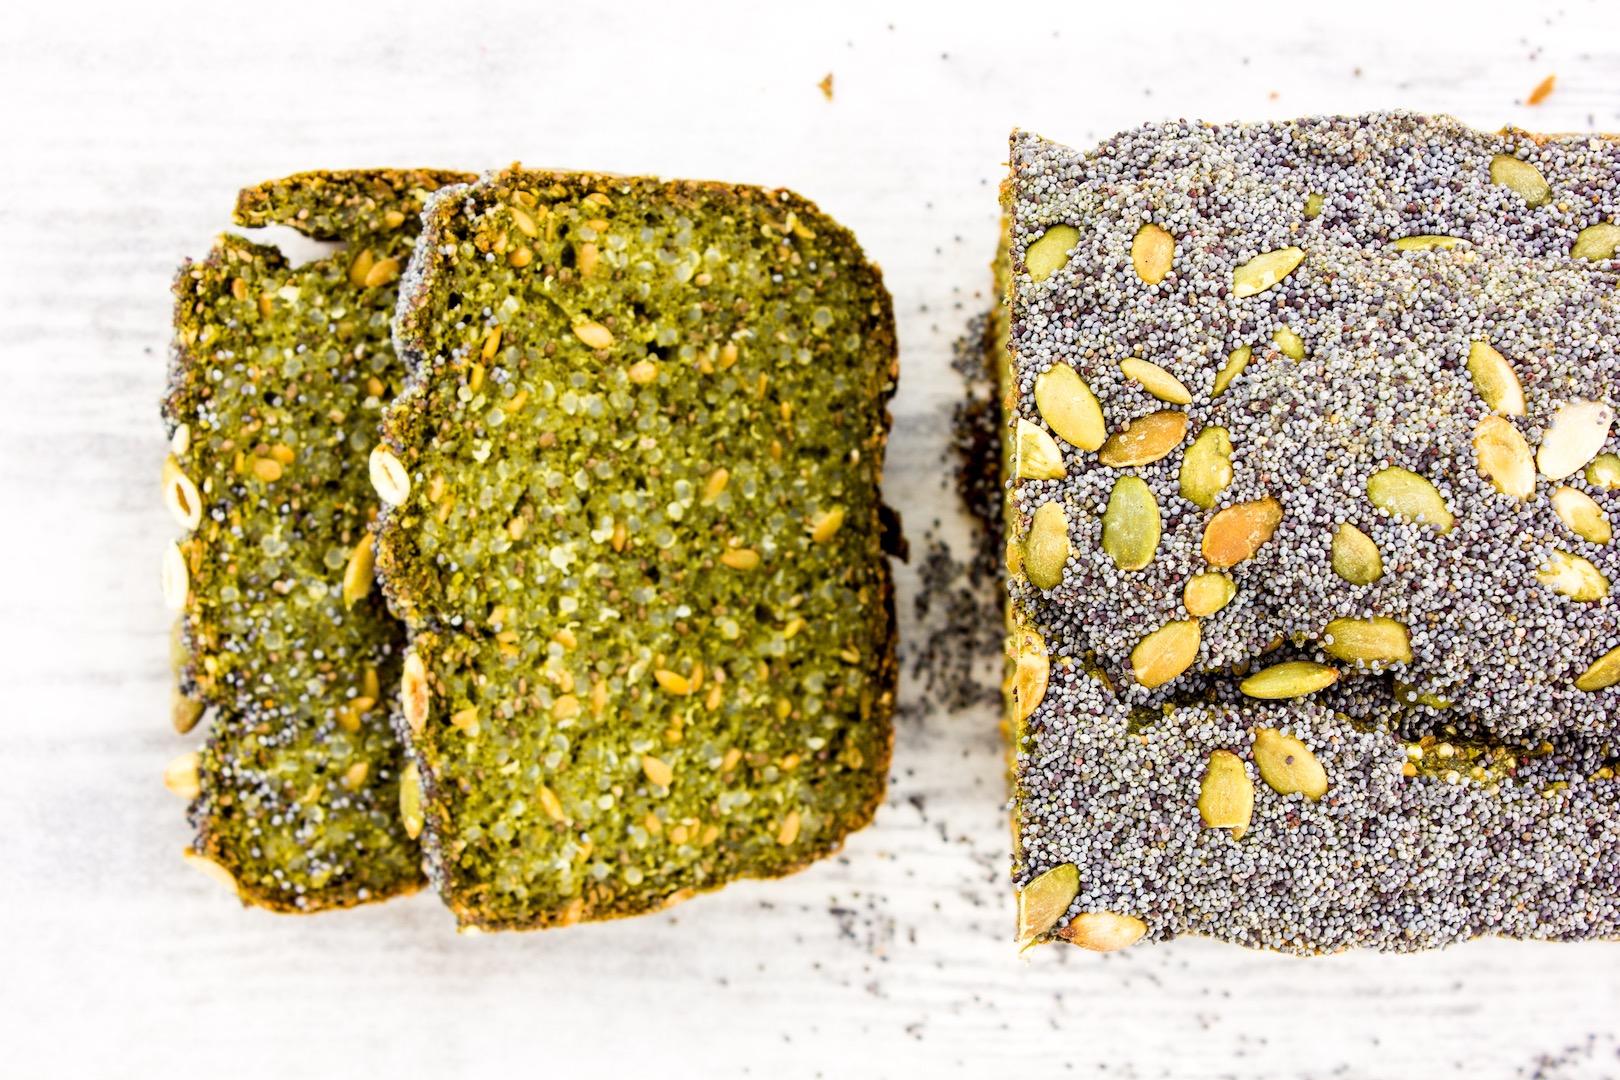 #healthy #quinoa #poppy #chlorella #bread #glutenfree #easy #vegan